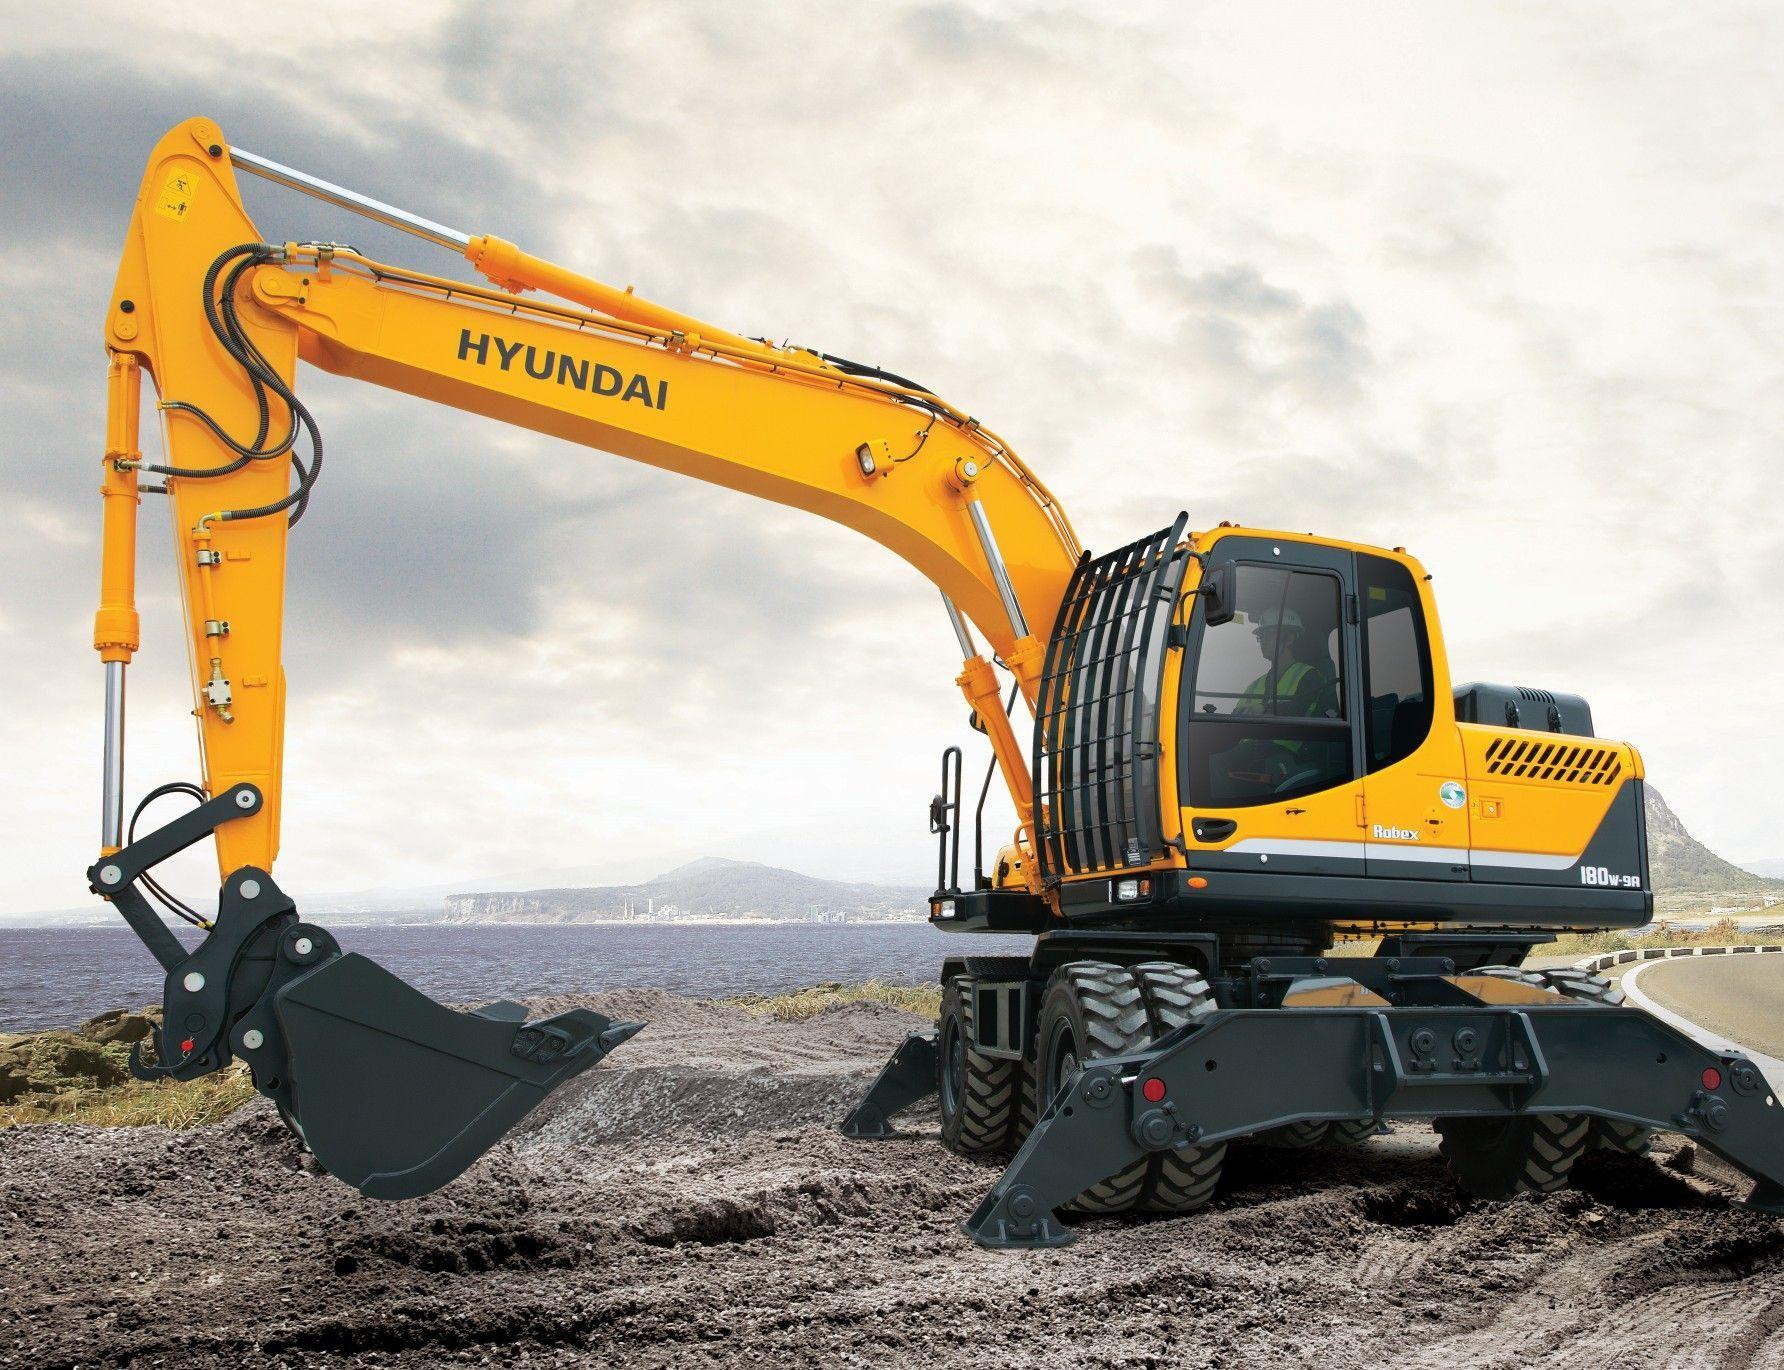 R180w 9a Wheeled Excavator Diggers Hyundai